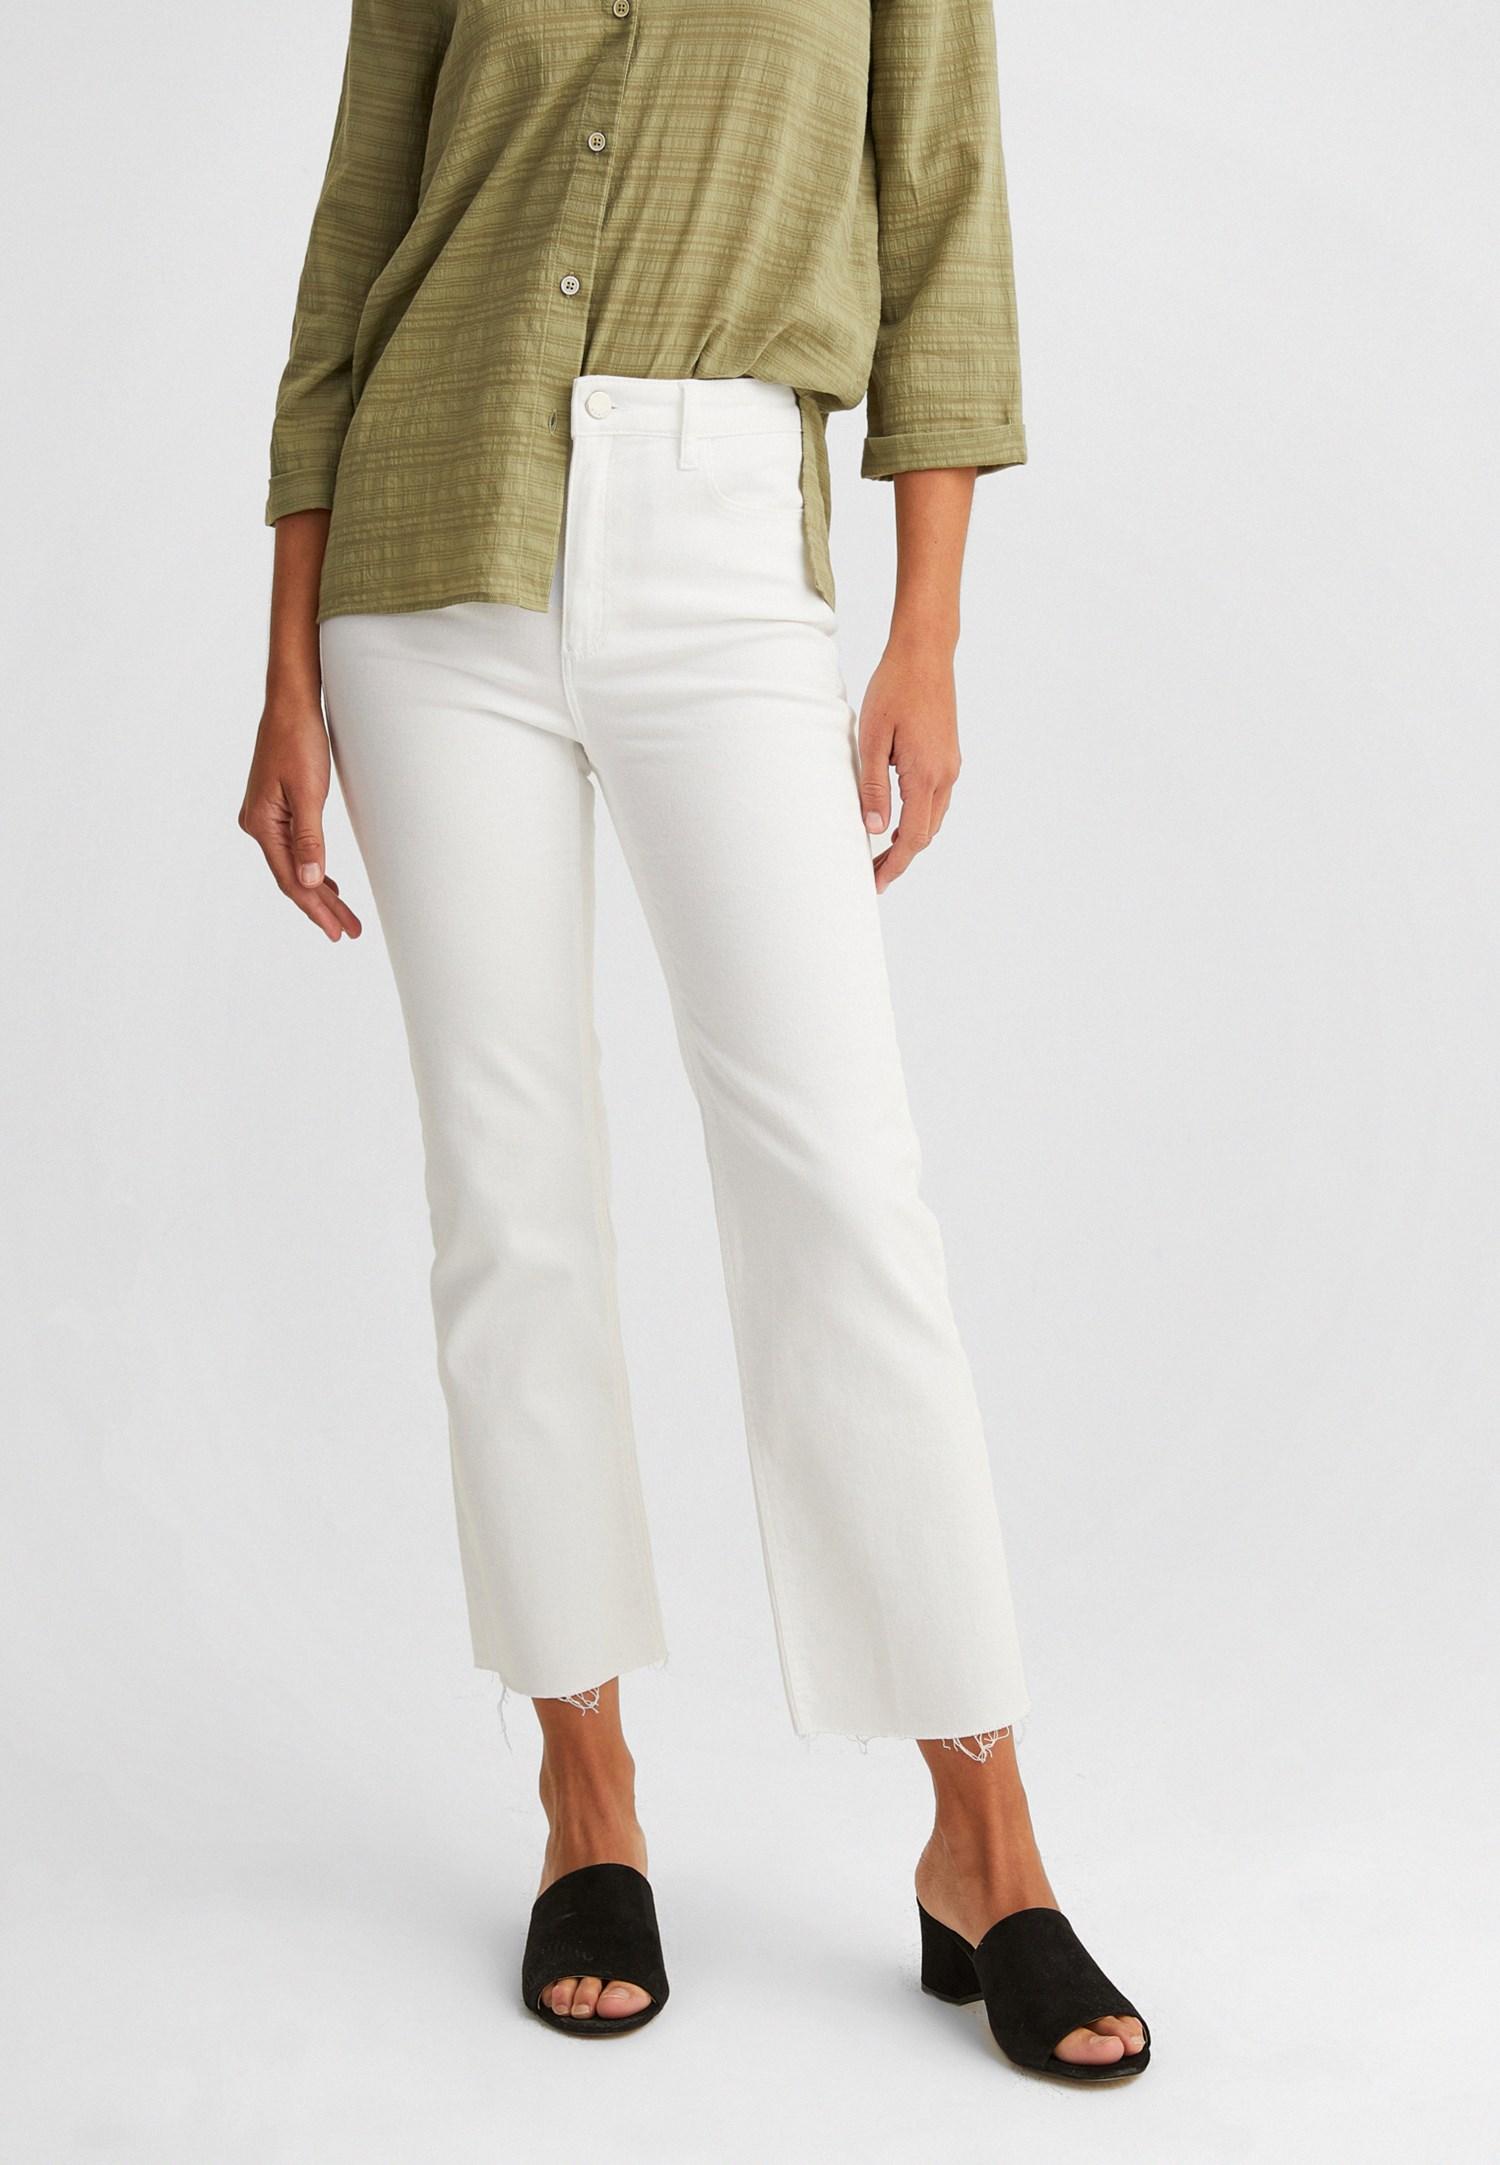 Bayan Beyaz Yüksek Bel Kısa İspanyol Paça Pantolon